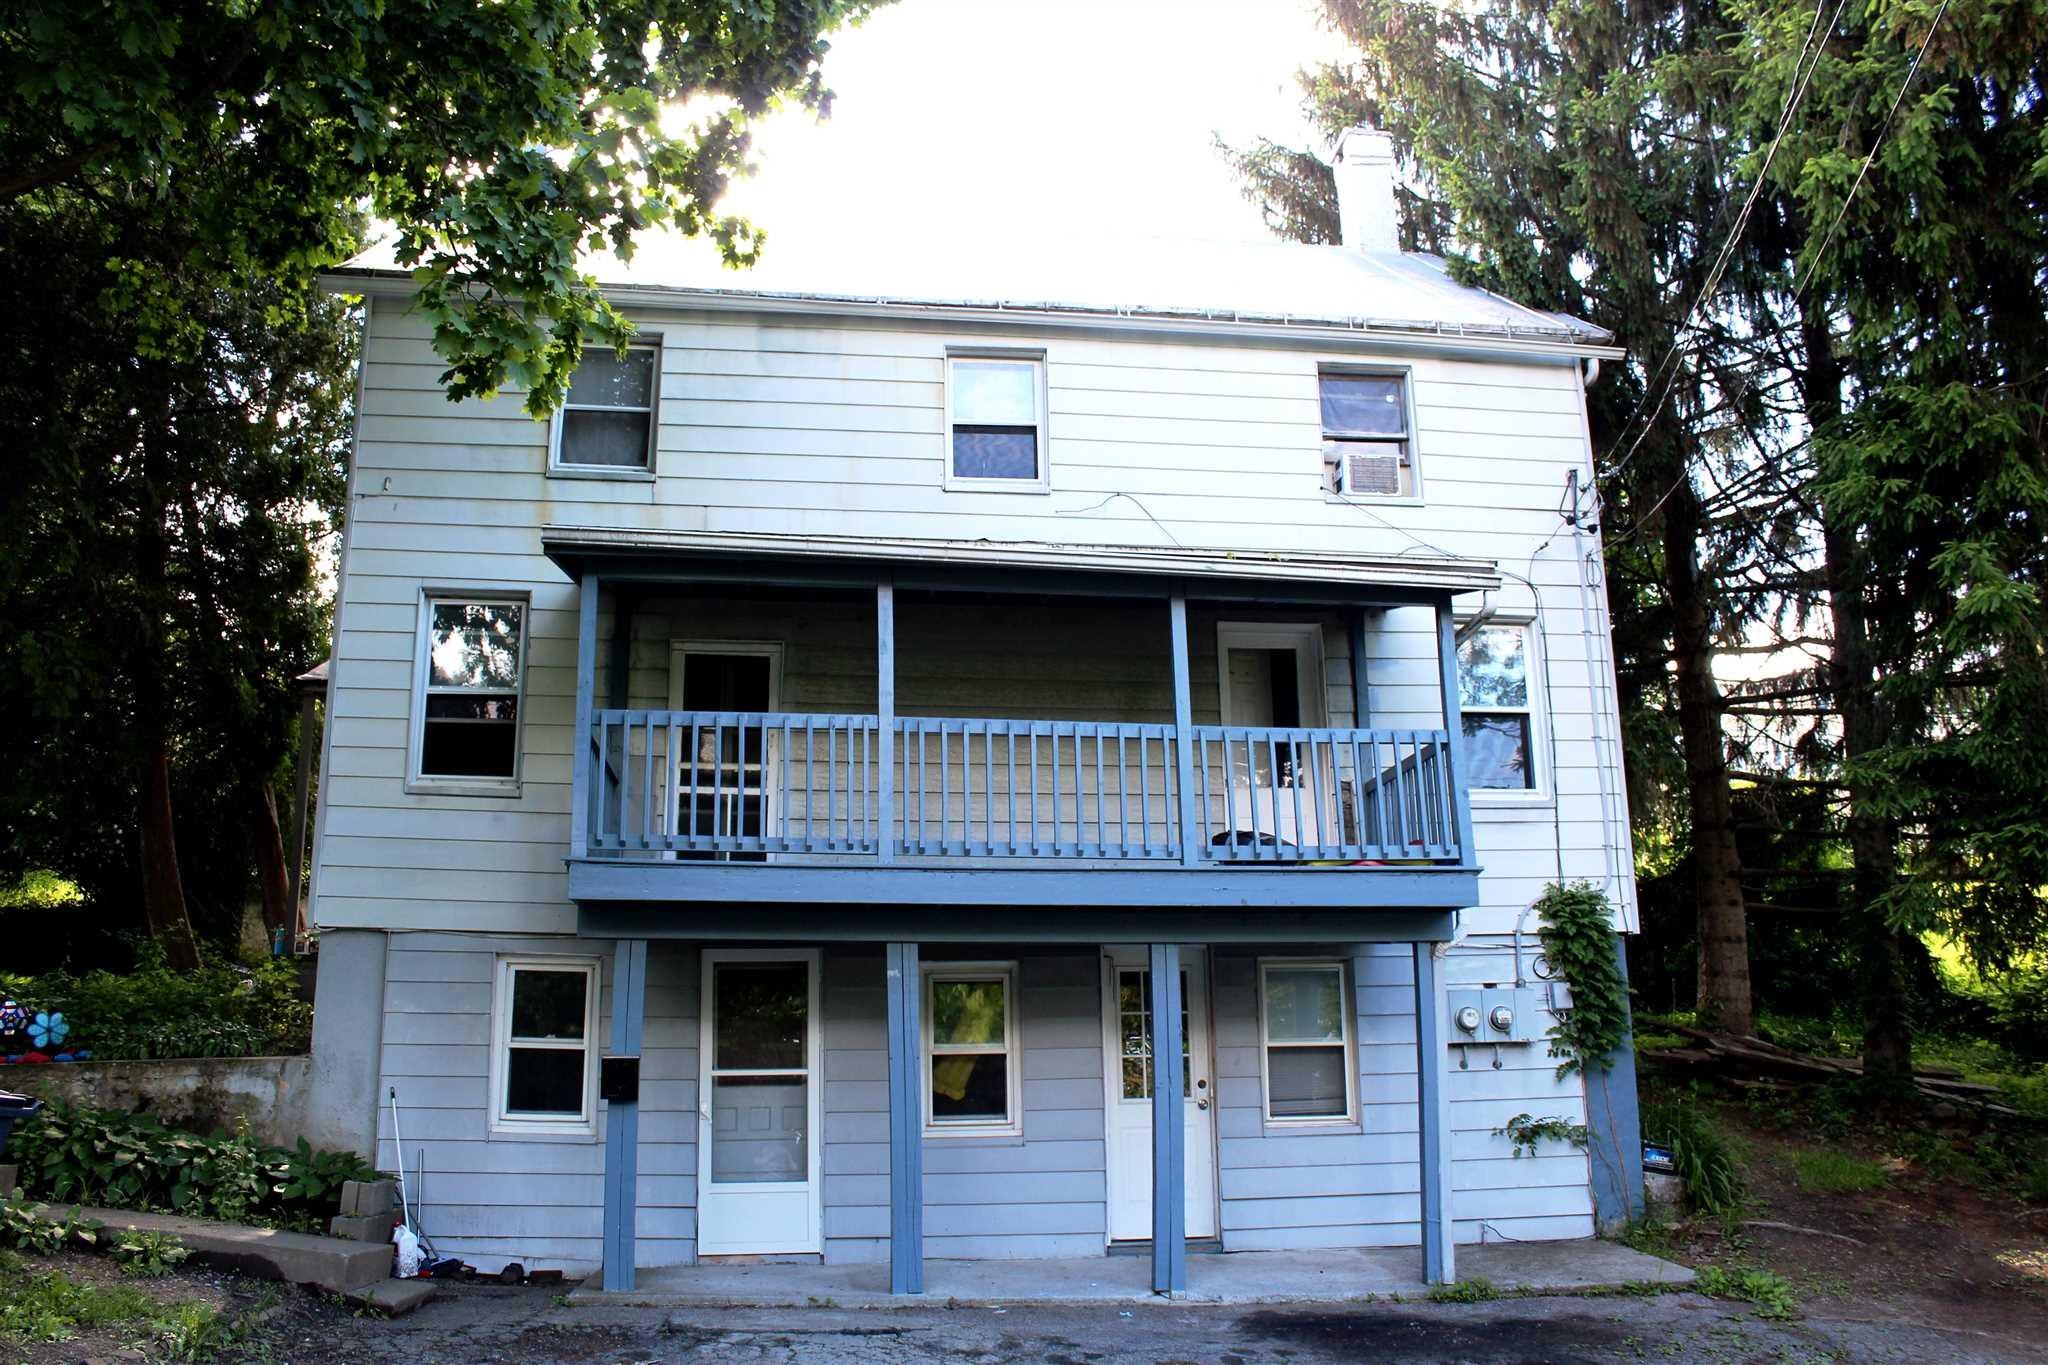 Single Family Home for Sale at 76 GRAND Street 76 GRAND Street Marlboro, New York 12542 United States